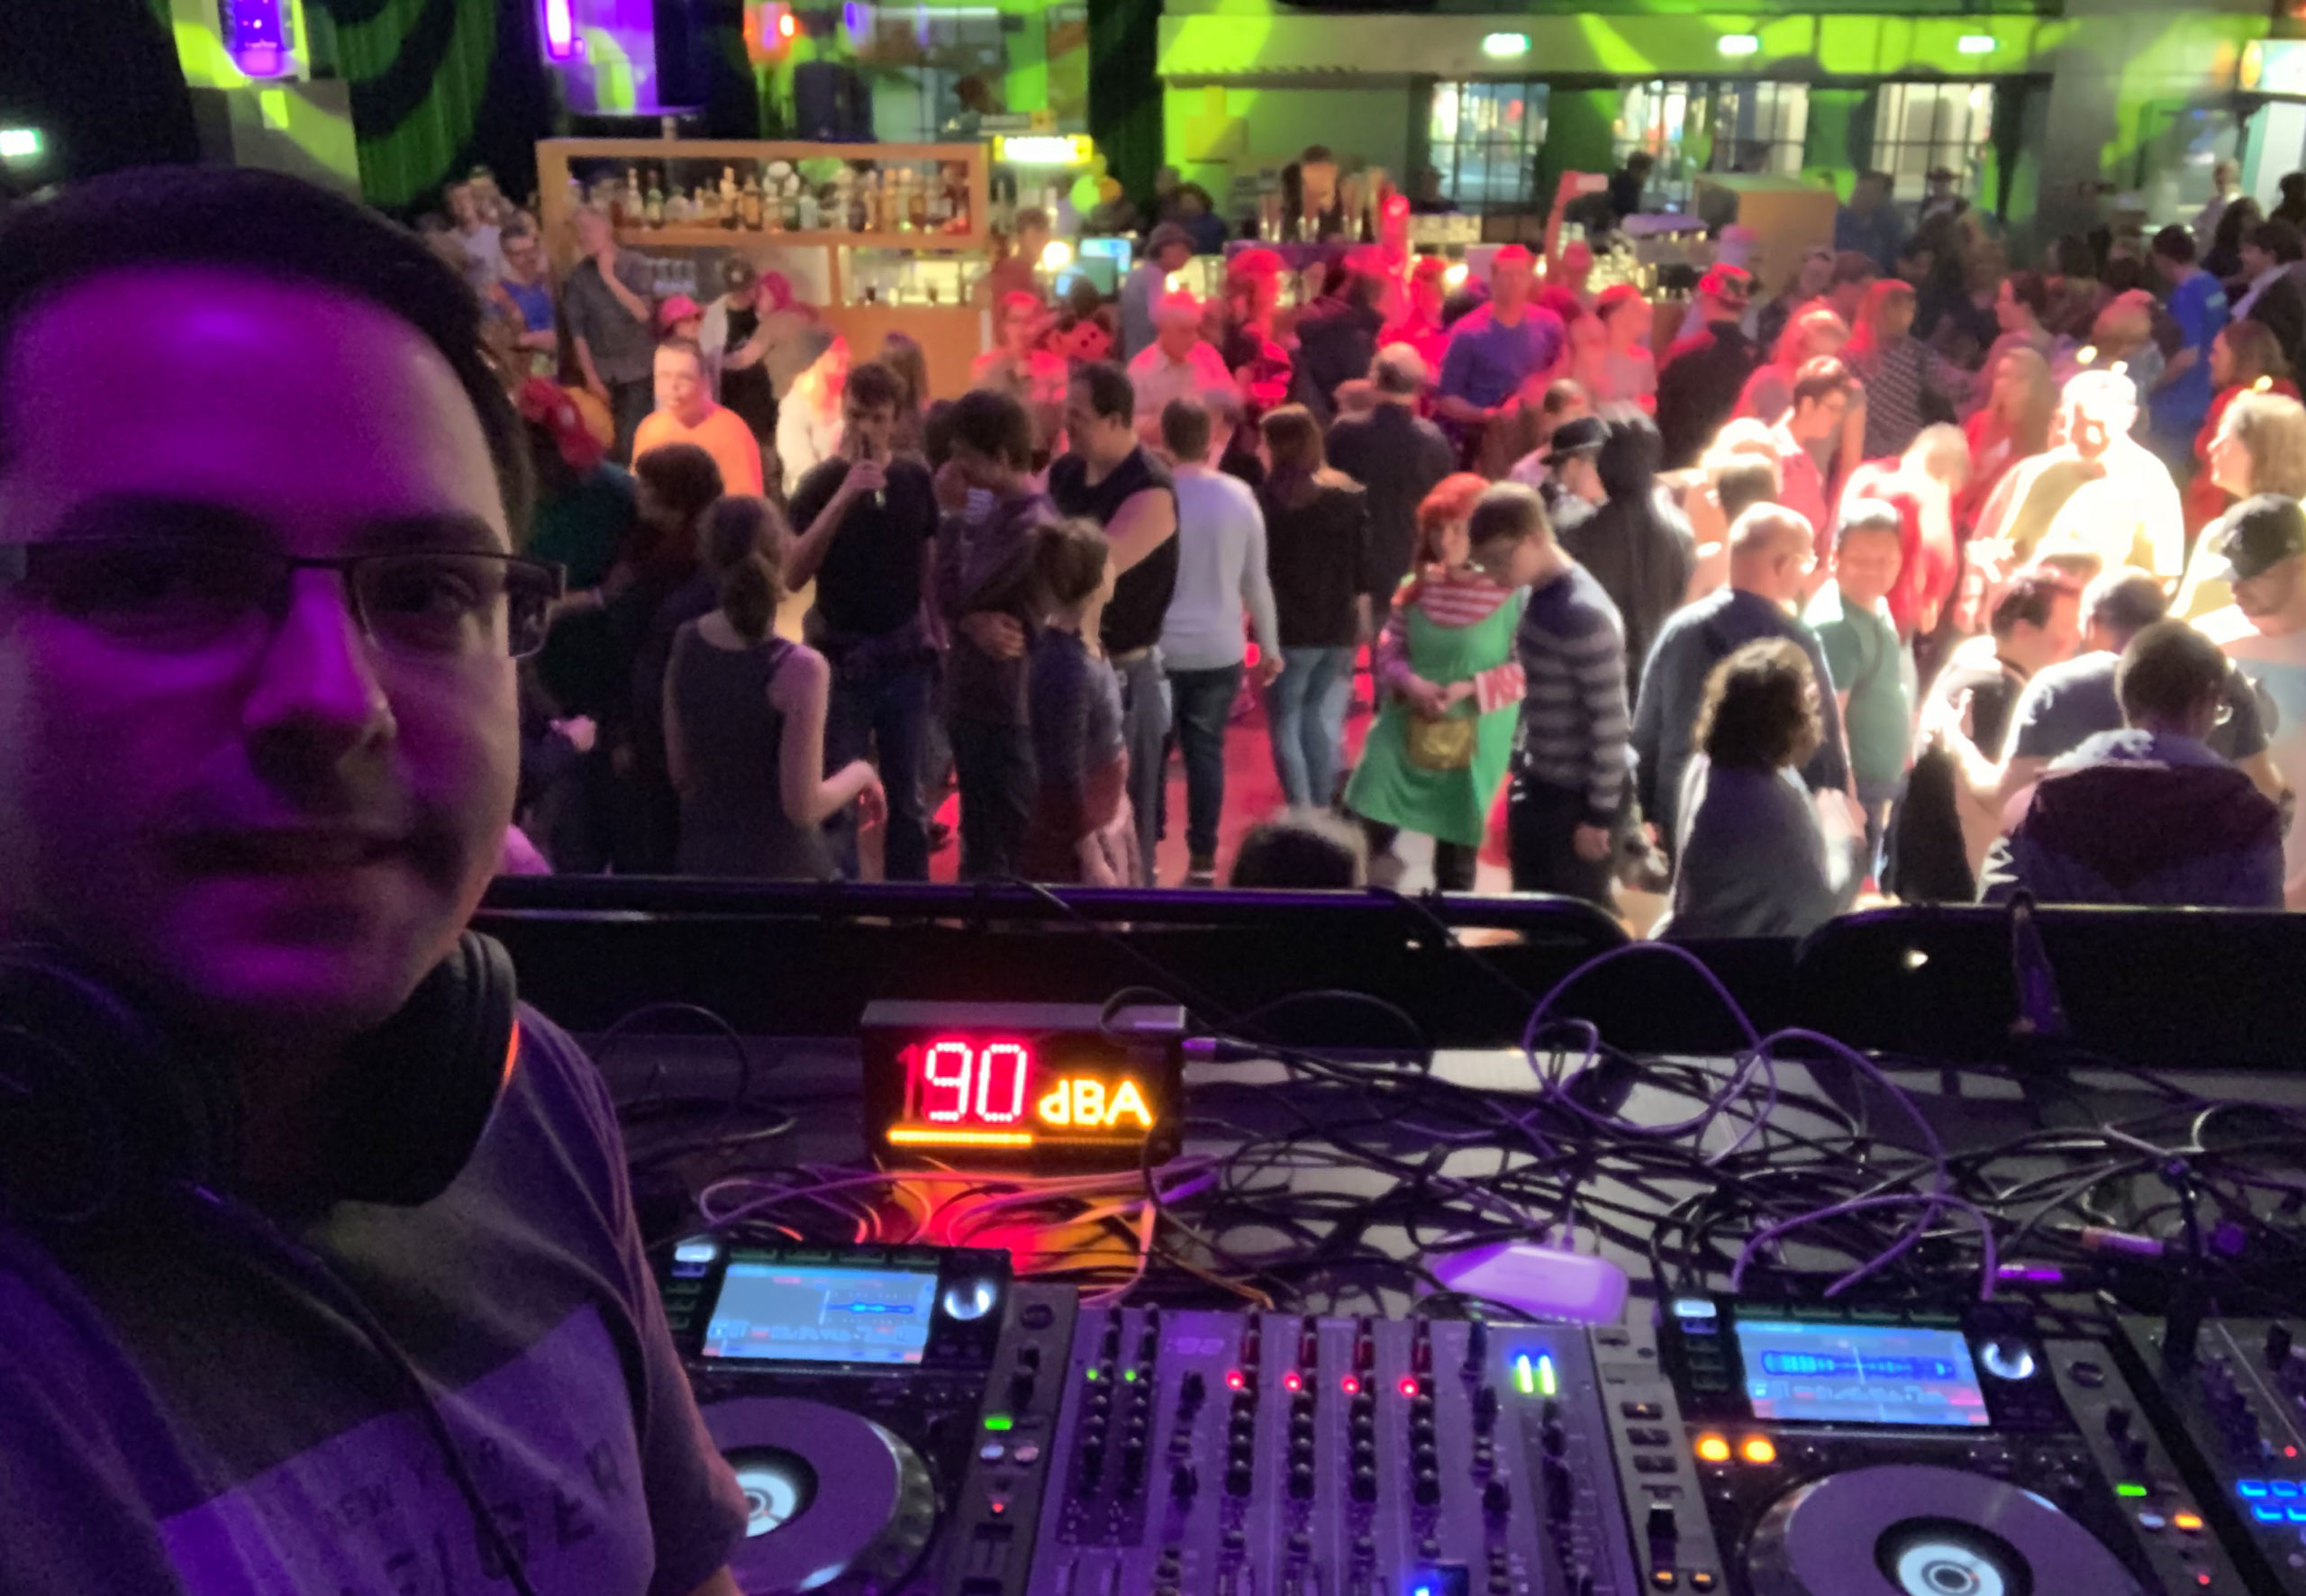 Club-oder-Sozial-1300x900